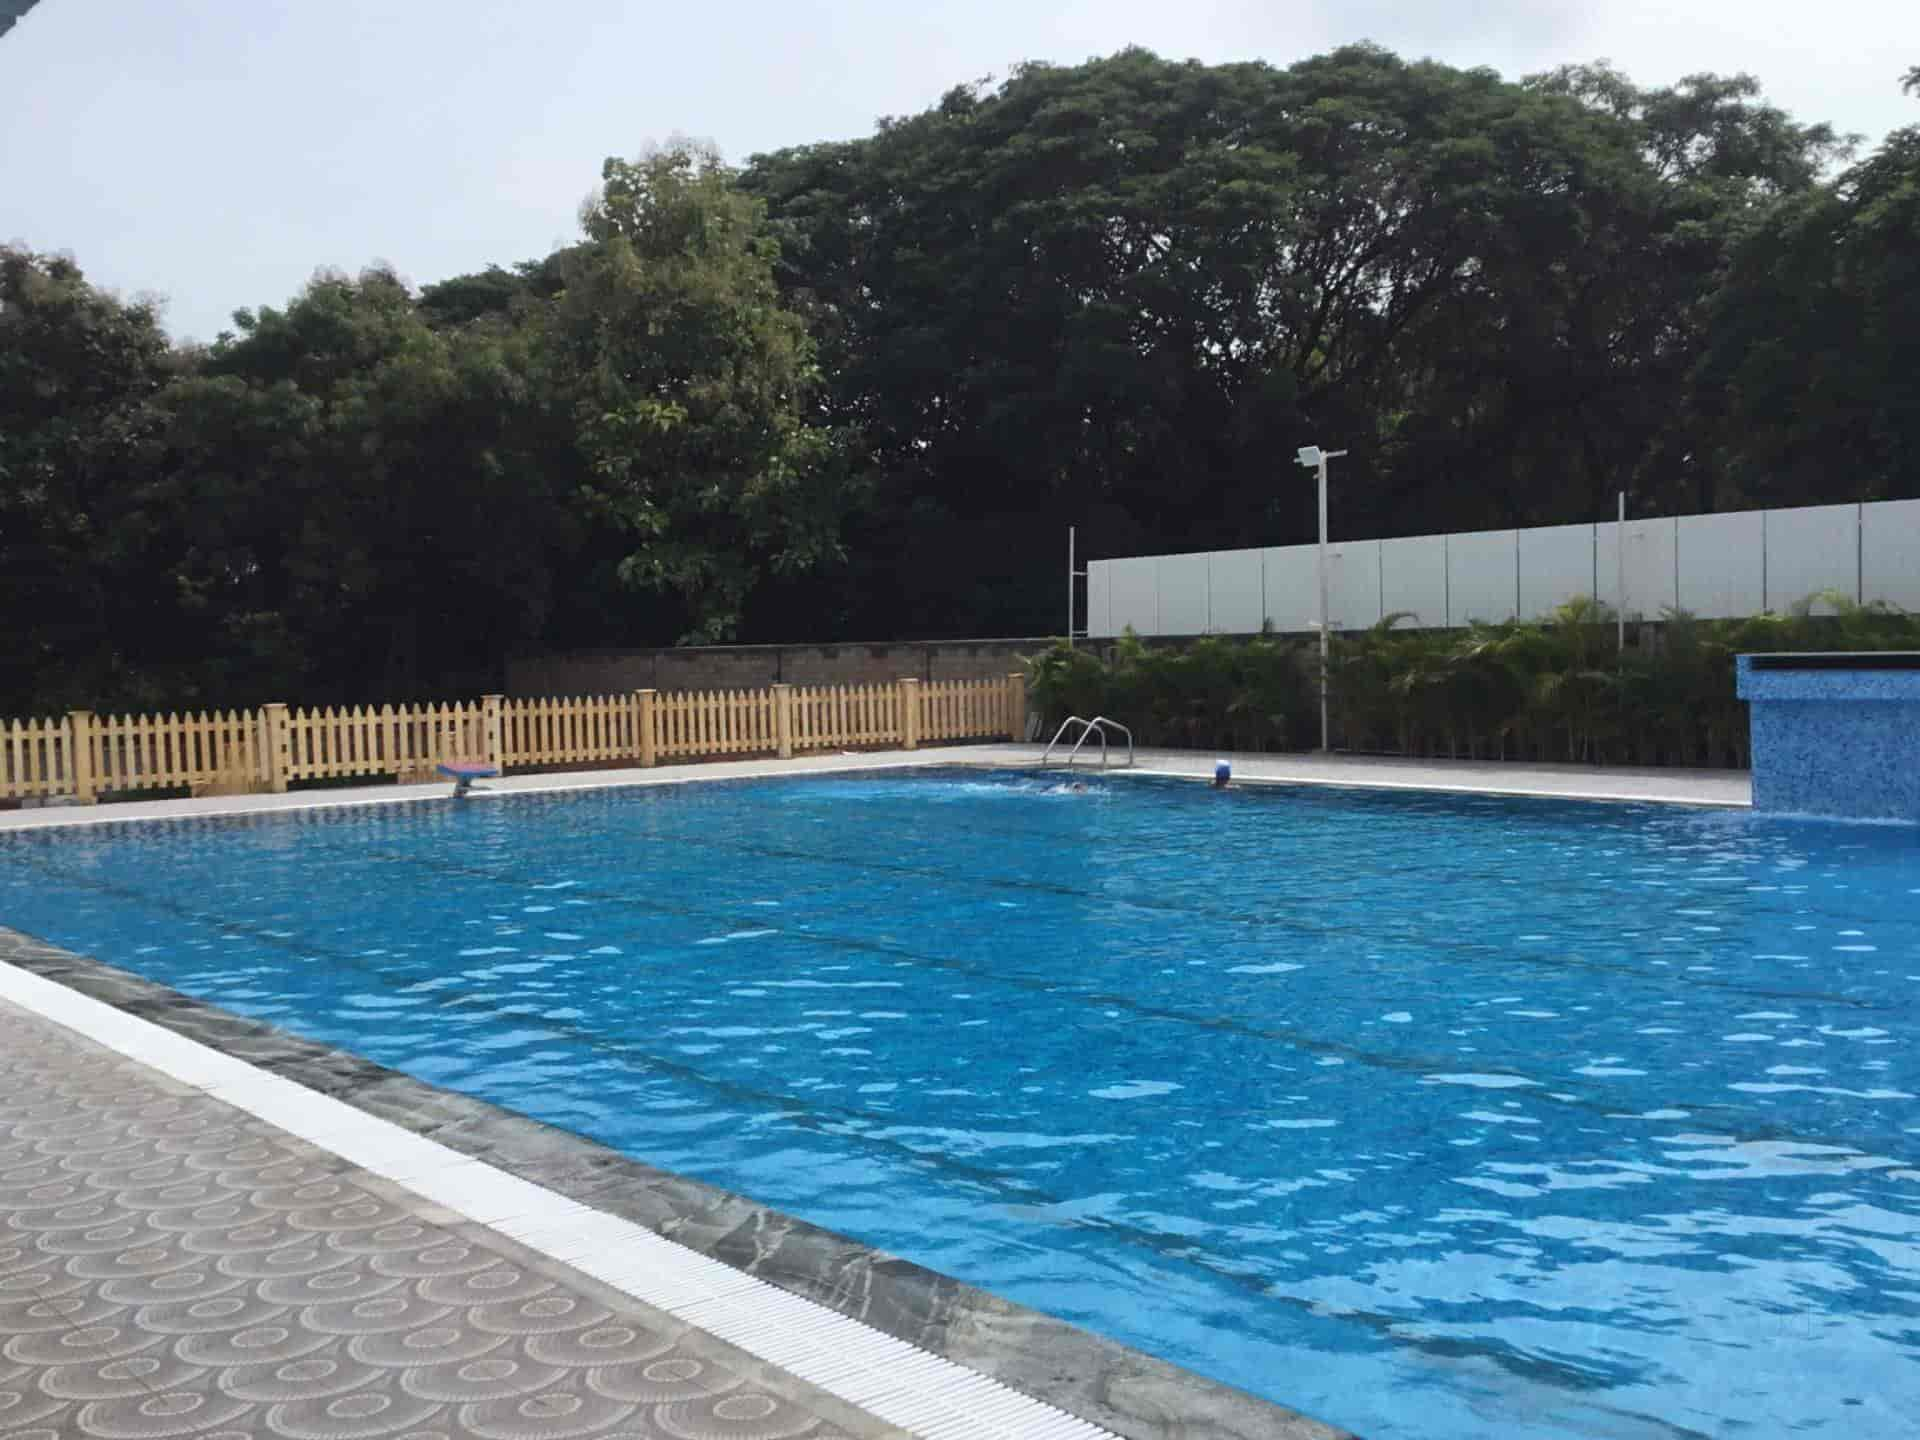 Sagar Pools U0026 Spa, Hebbal   Swimming Pool Accessory Dealers In Mysore    Justdial